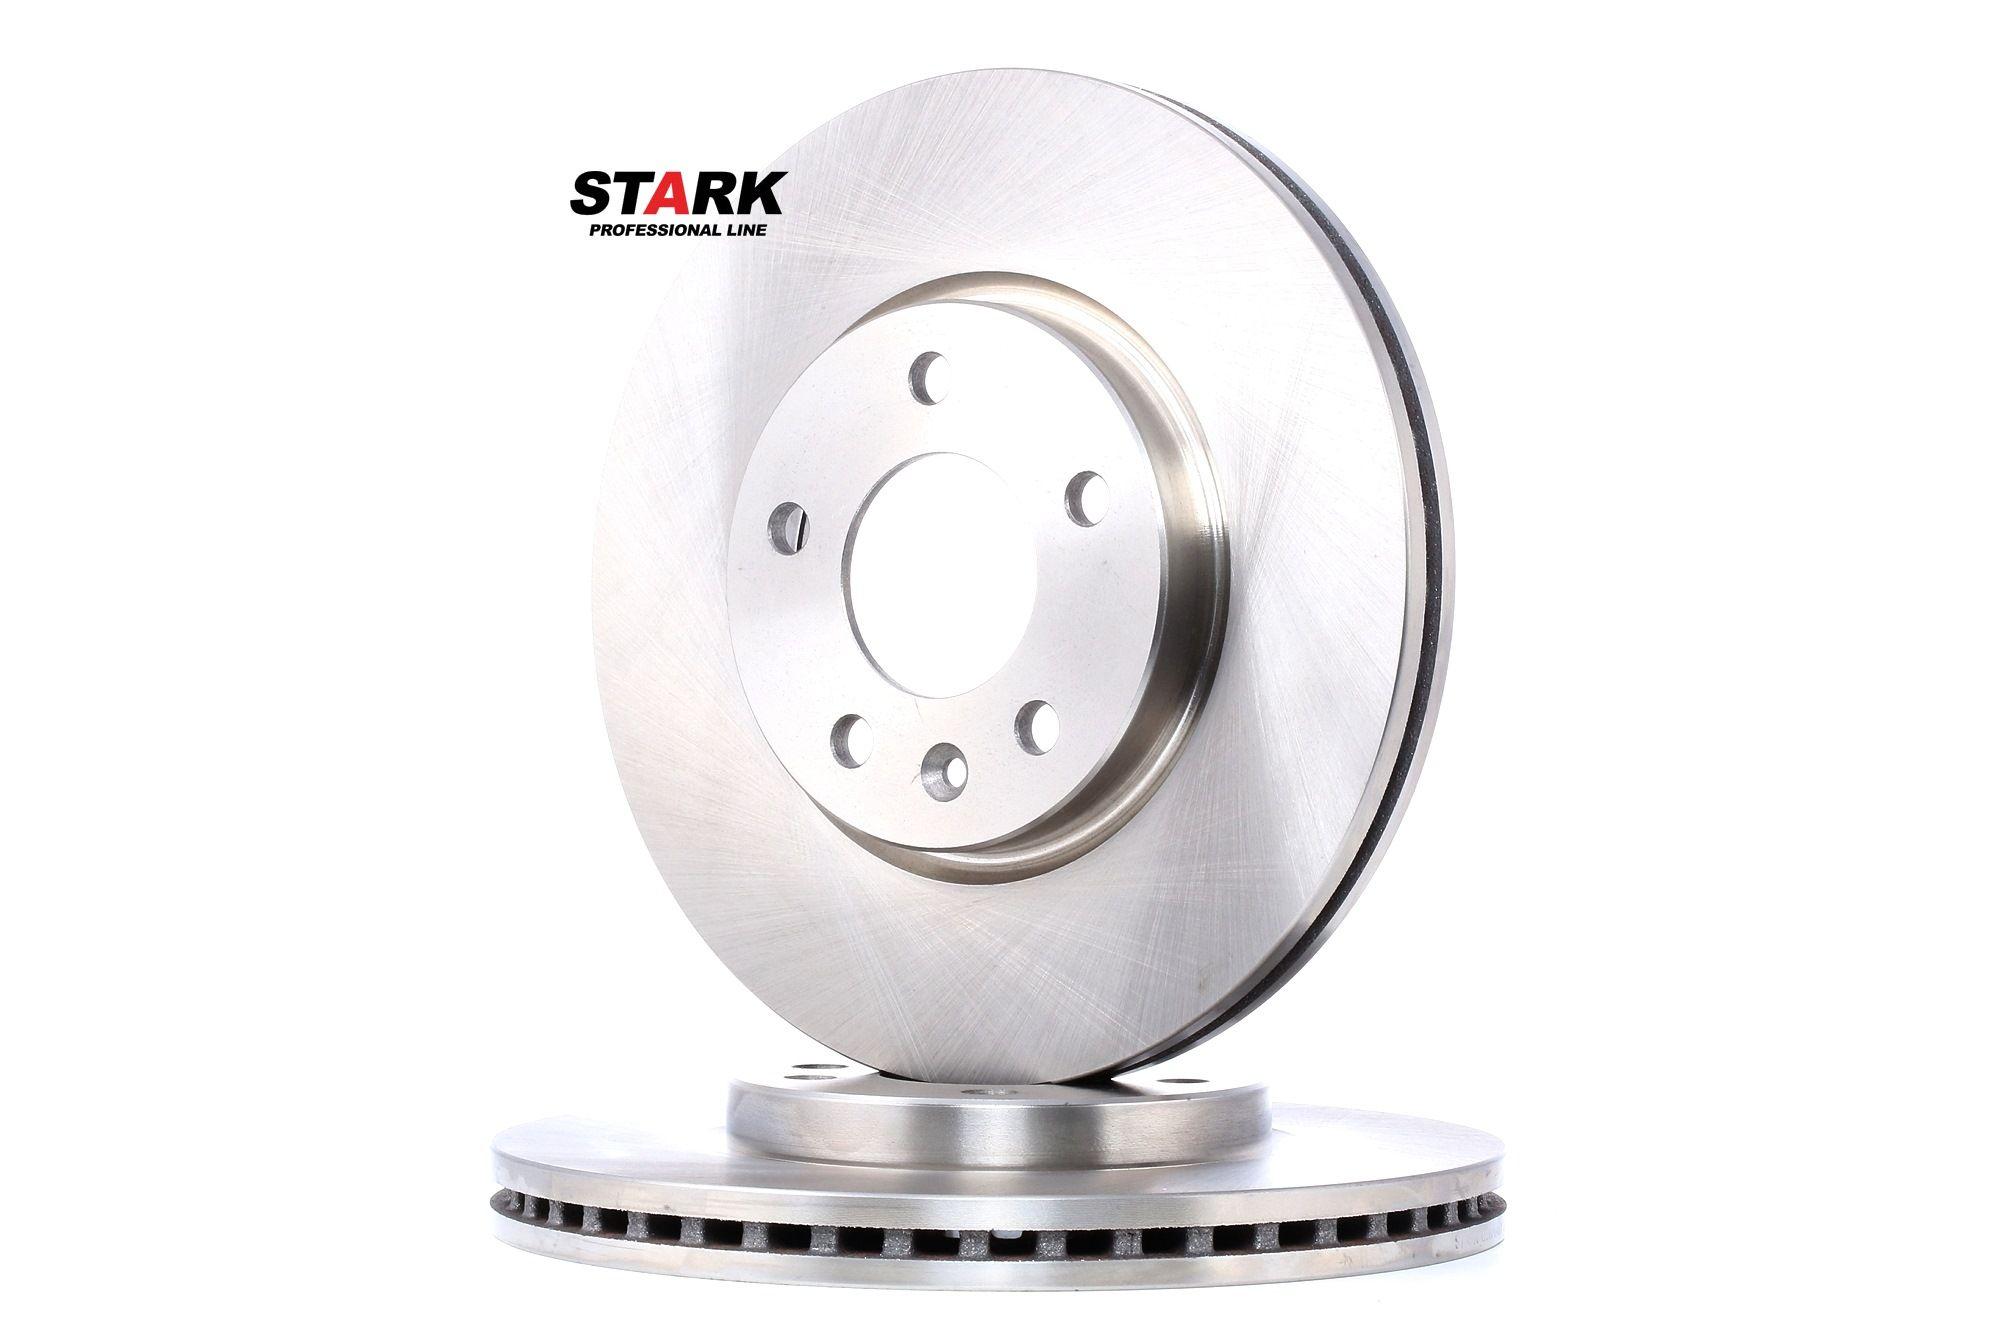 STARK %ART_NO_SYN_CLEAR% %DYNAMIC_AUTOPART_SYNONYM% Opel Astra j p10 2.0 CDTI 2015 131 PS - Premium Autoteile-Angebot